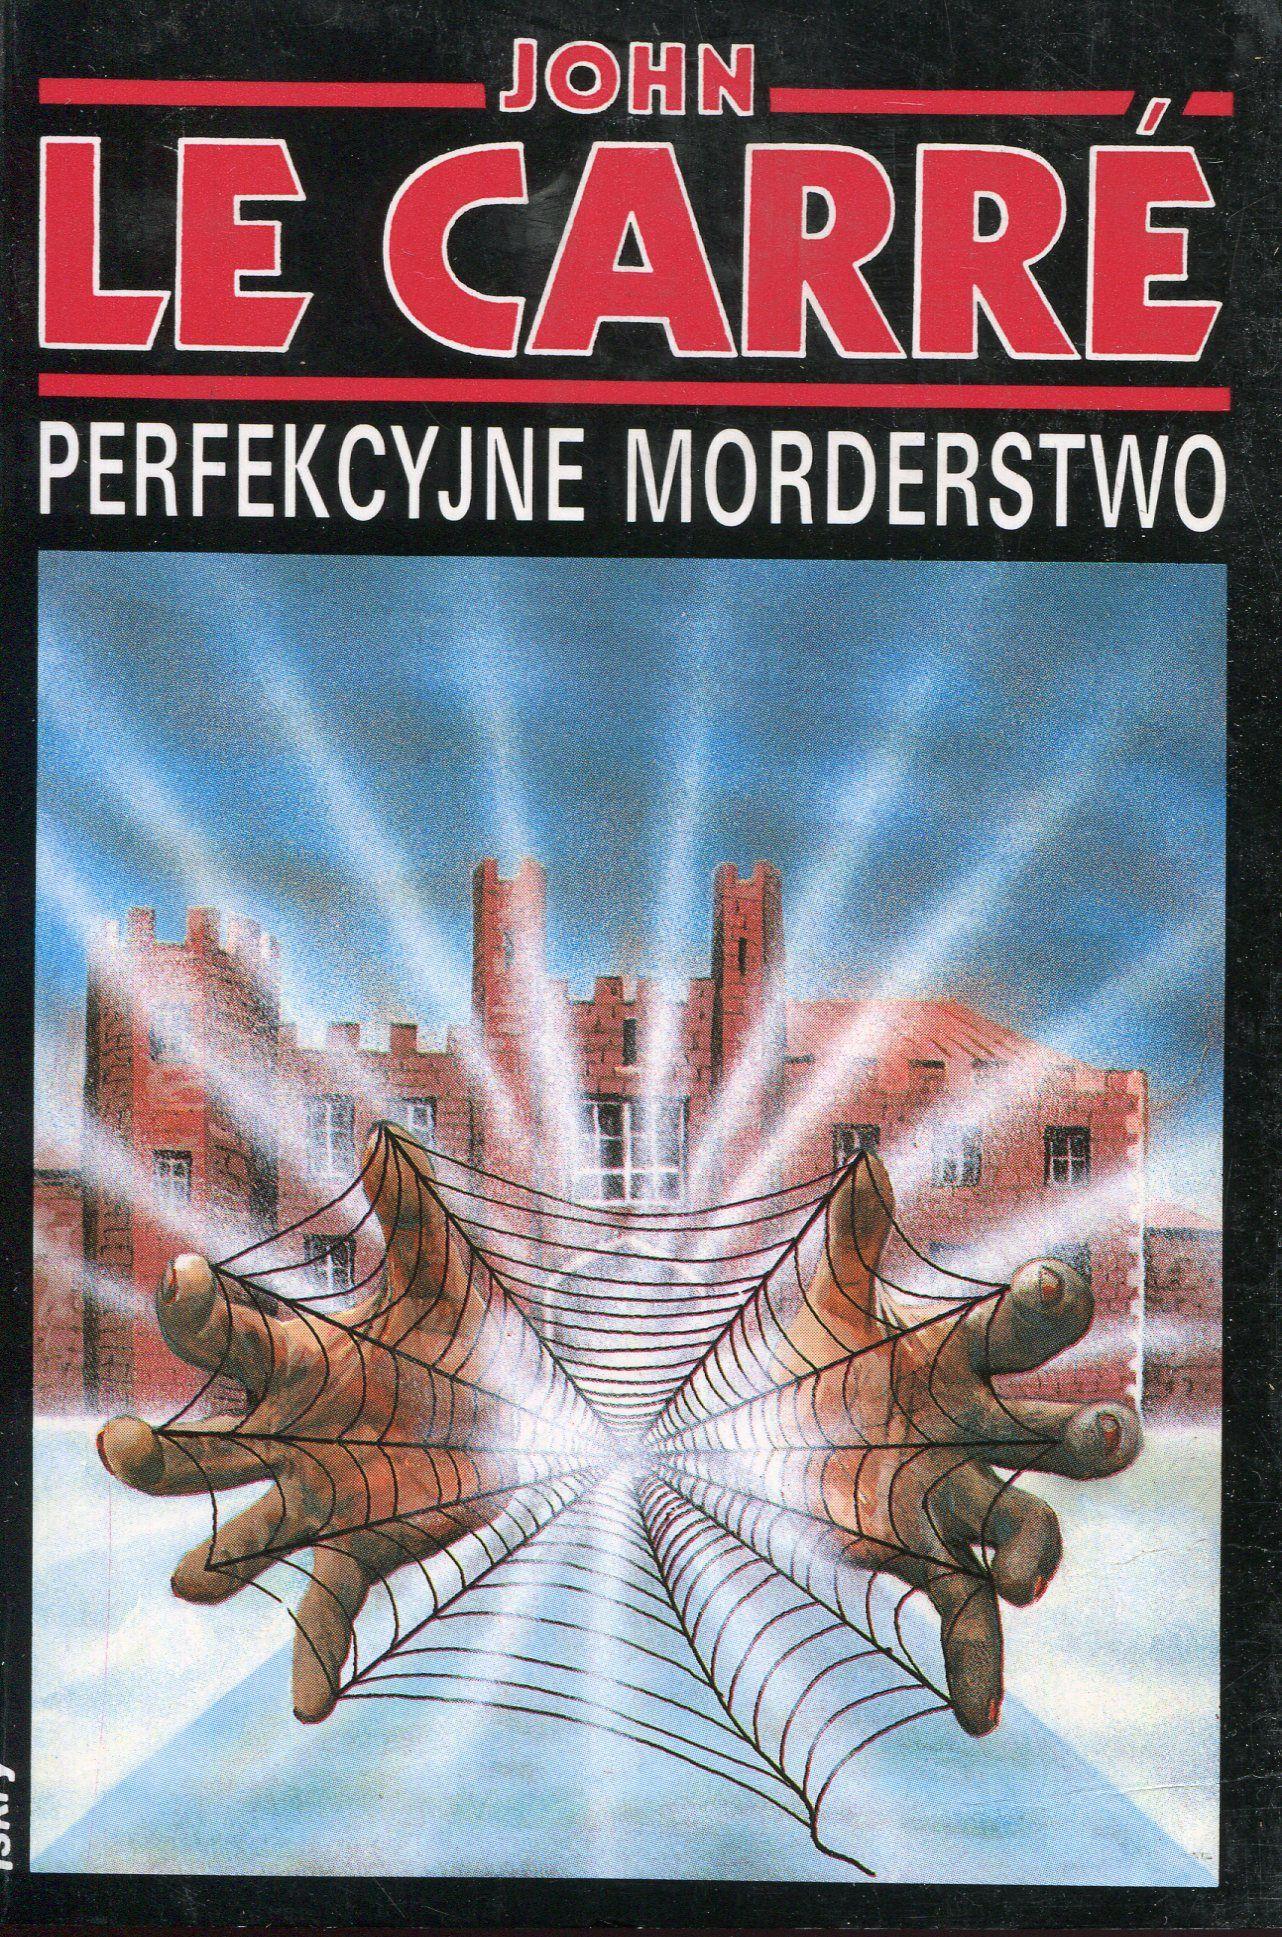 Perfekcyjne Morderstwo John Le Carre Translated By Michal Roniker Cover By Krystyna Topfer Illustrated By Roman Kirilenko Published By Wy Ksiazki Film Muzyka